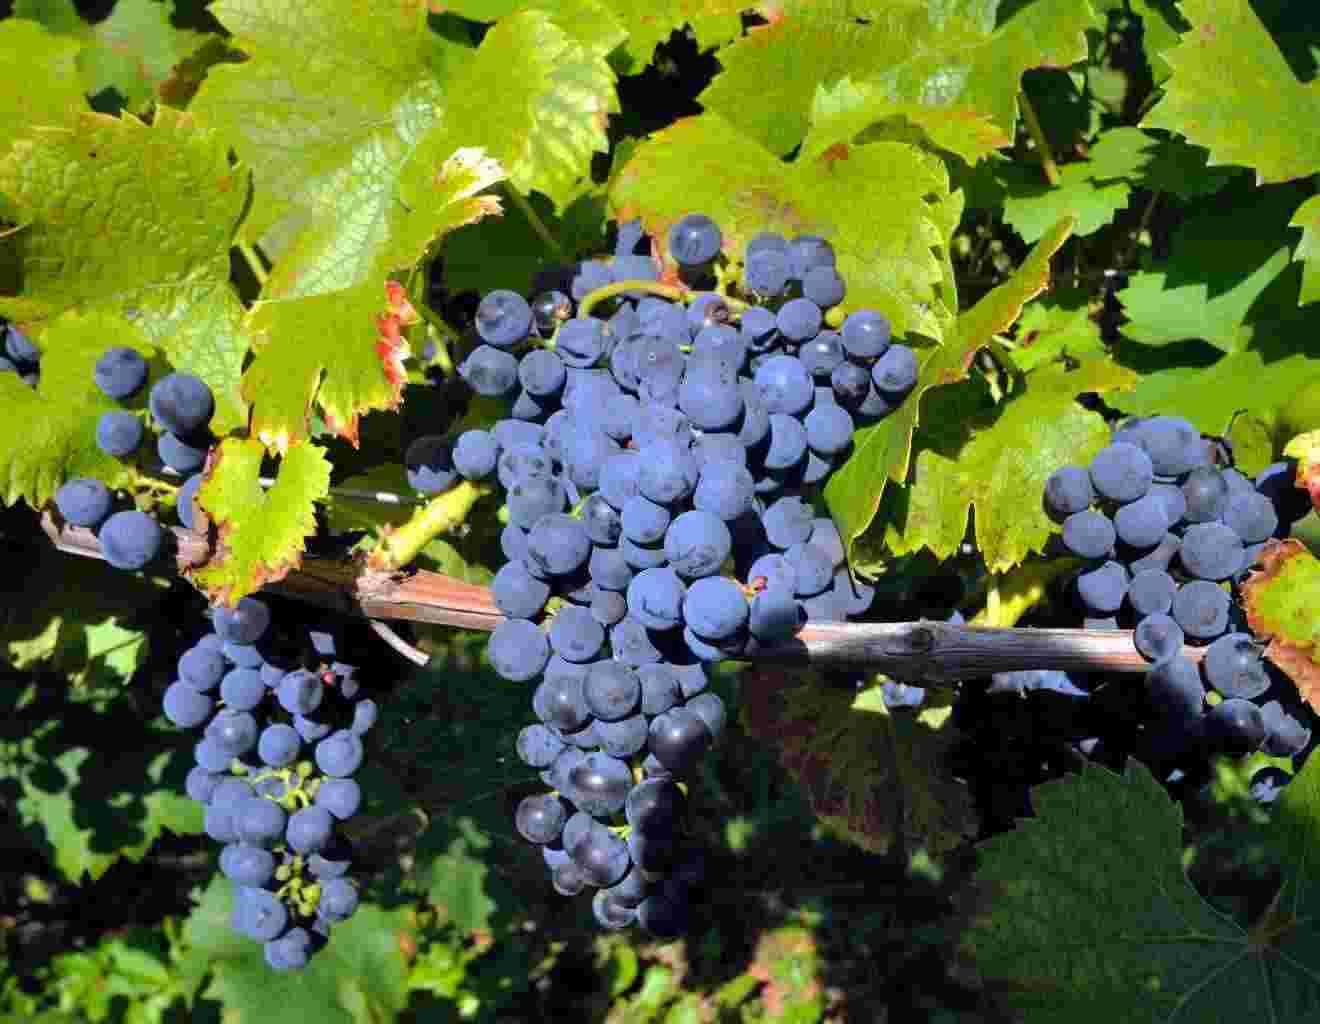 Vendita Uva da vino nera e bianca qualità eccellente